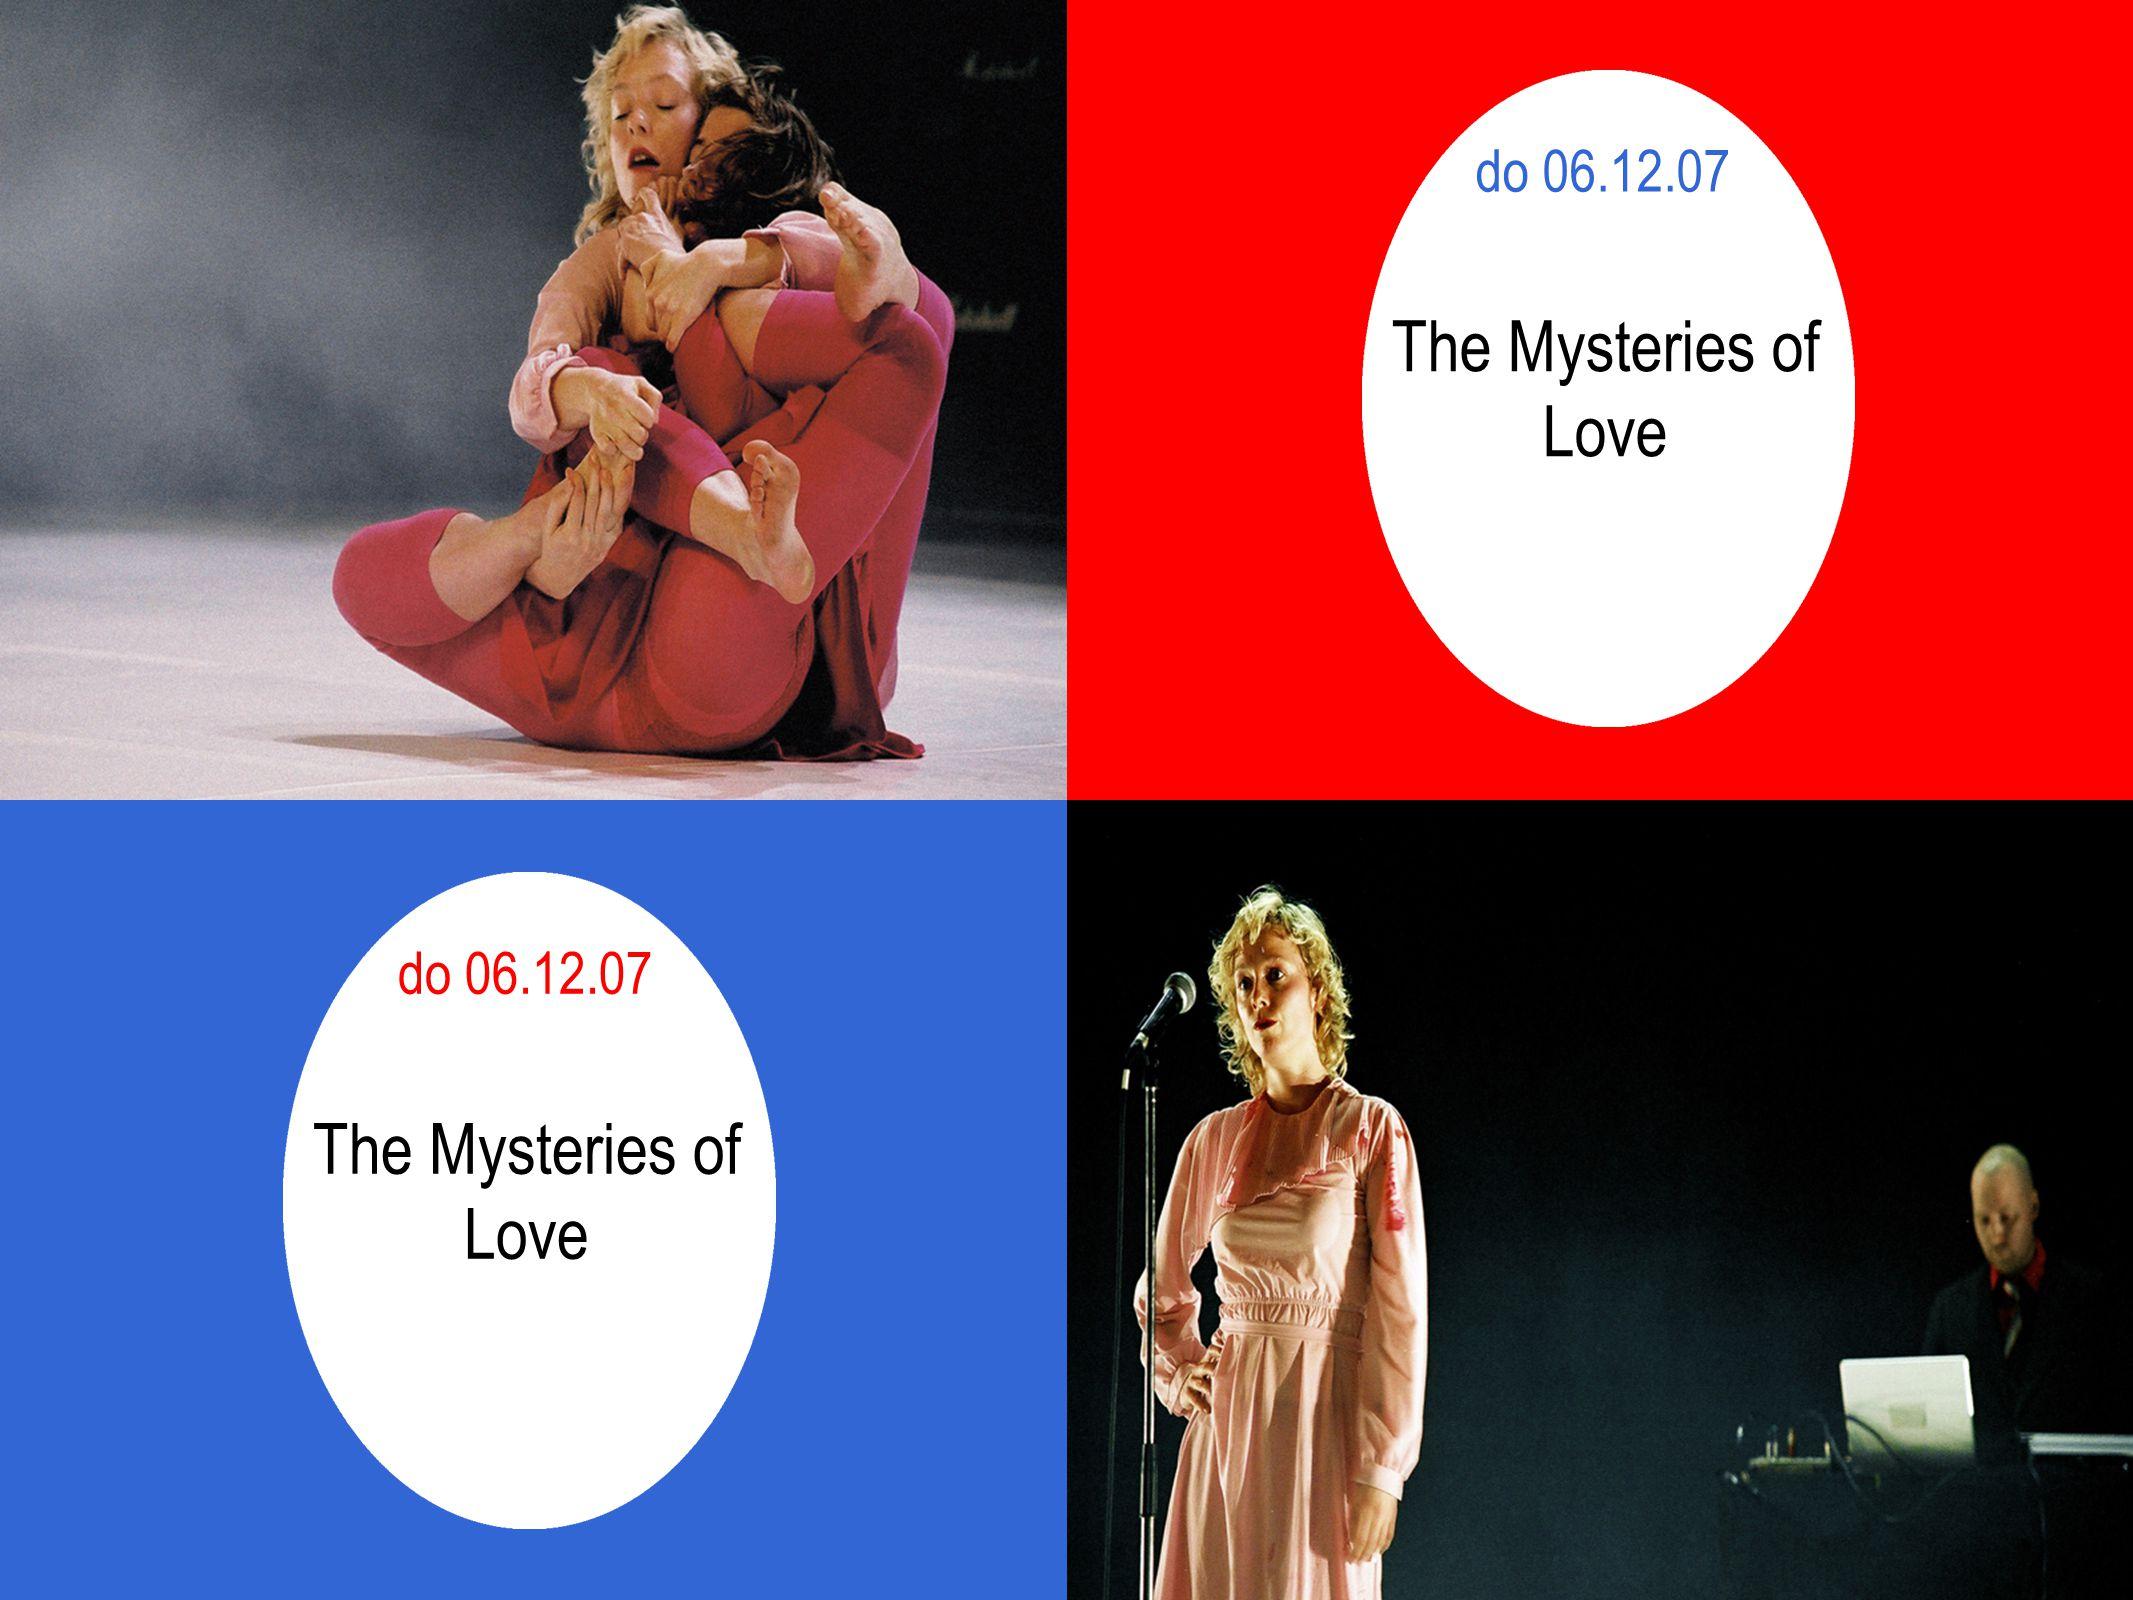 do 06.12.07 The Mysteries of Love do 06.12.07 The Mysteries of Love